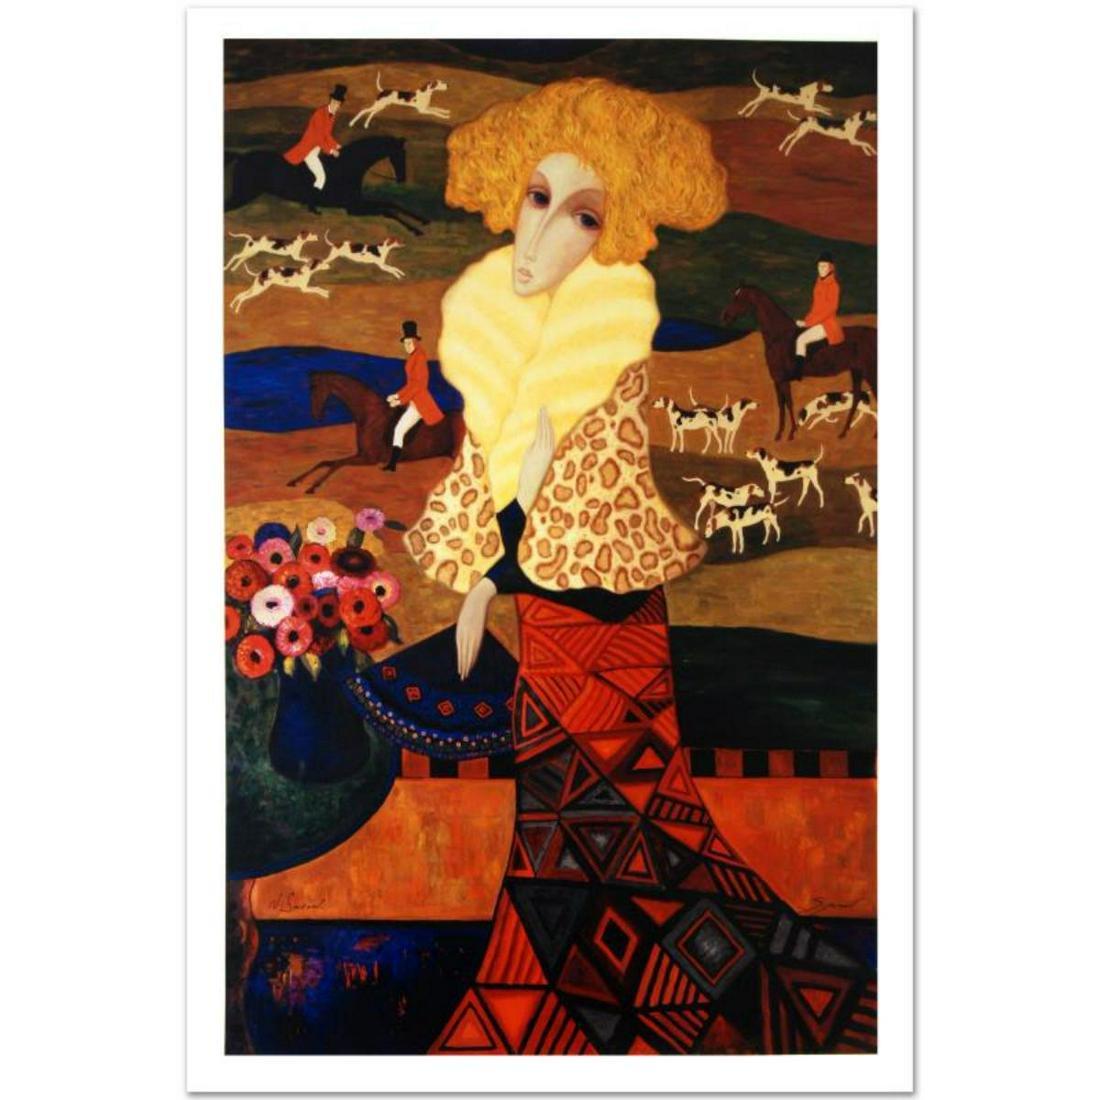 Legendary Russian Artist Sergey Smirnov (1953-2006).